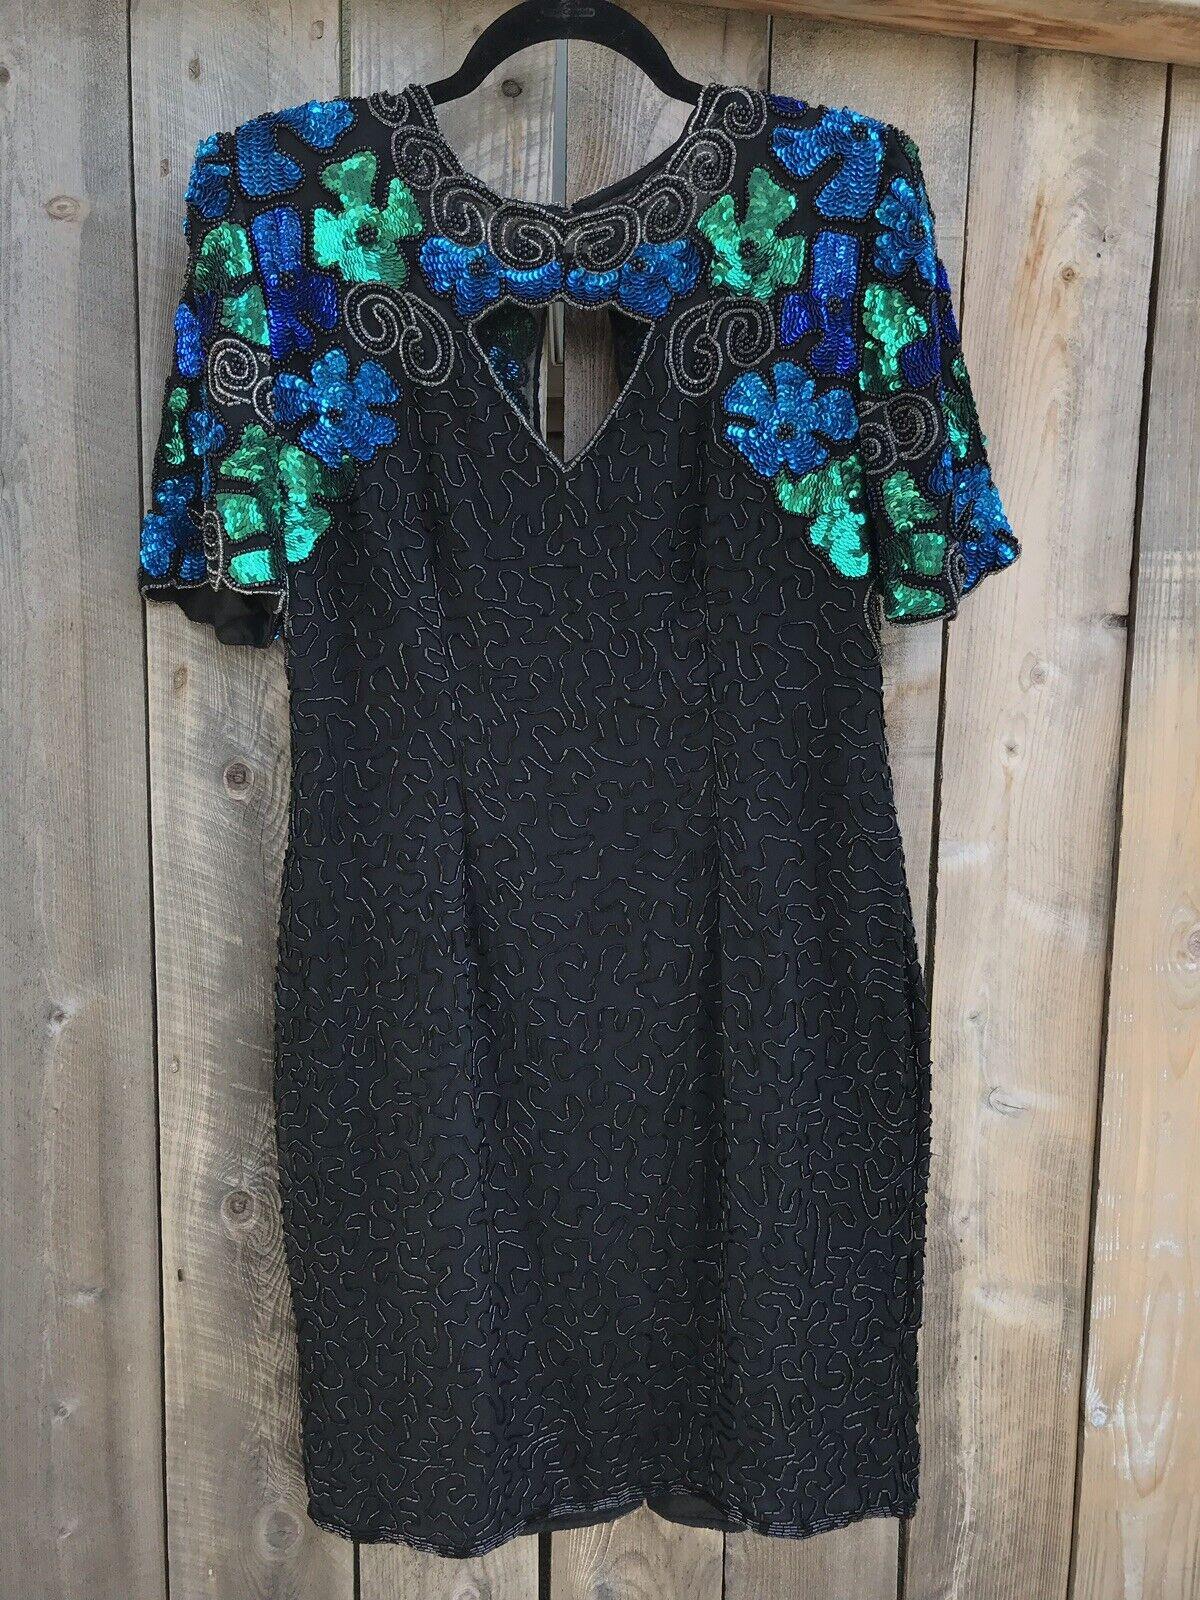 Laurence Kazar Sequin Beaded 100% Silk damen's Dress Größe XL